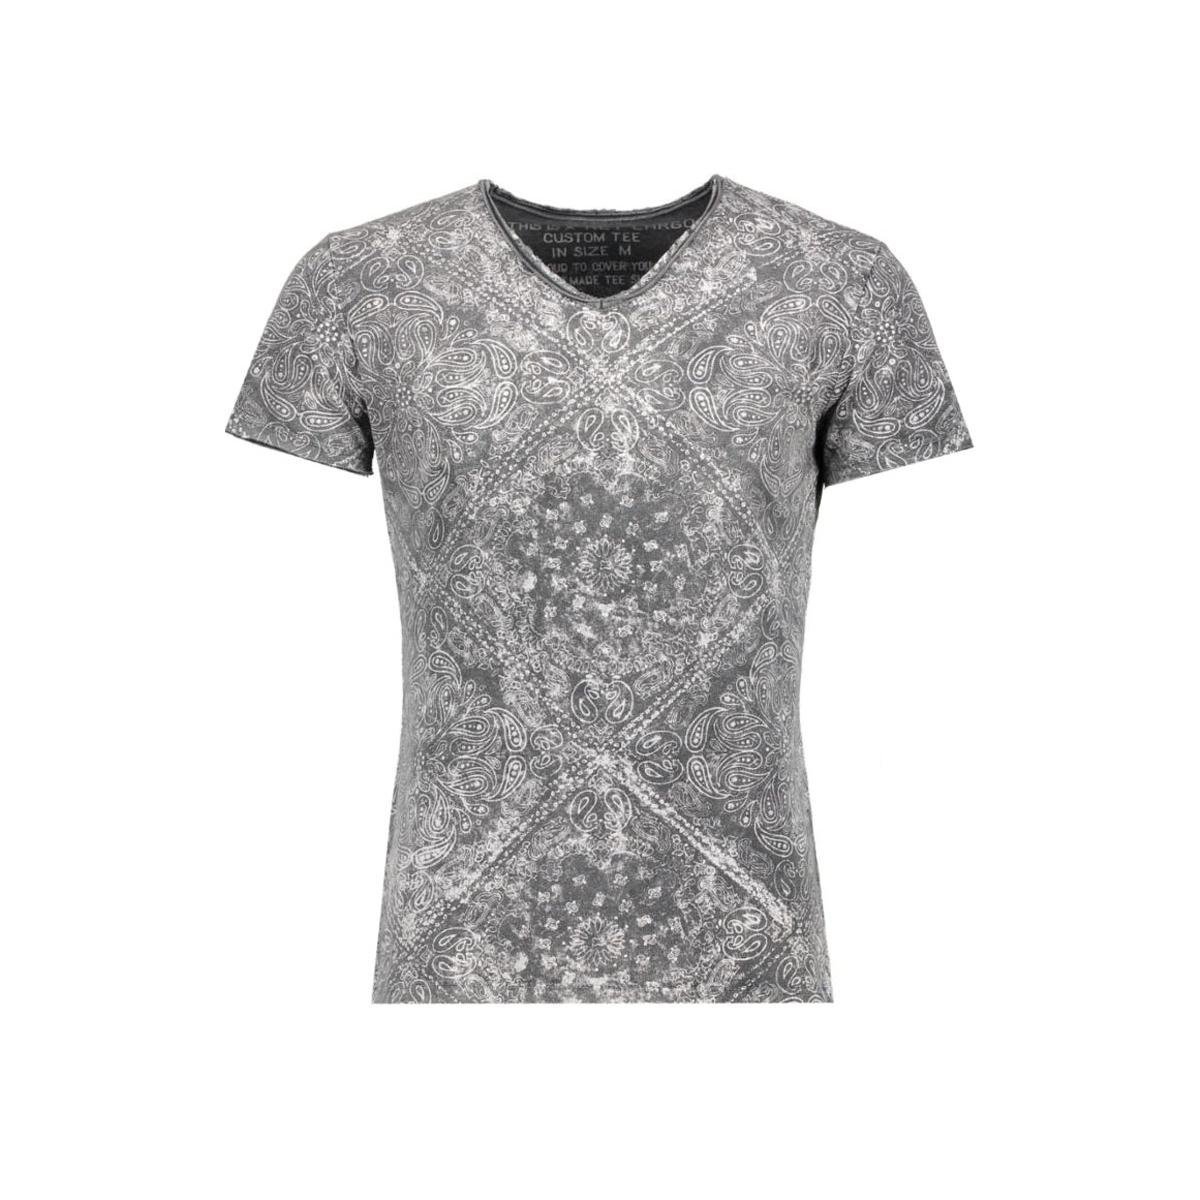 t00764 mexico key largo t-shirt 1100 black